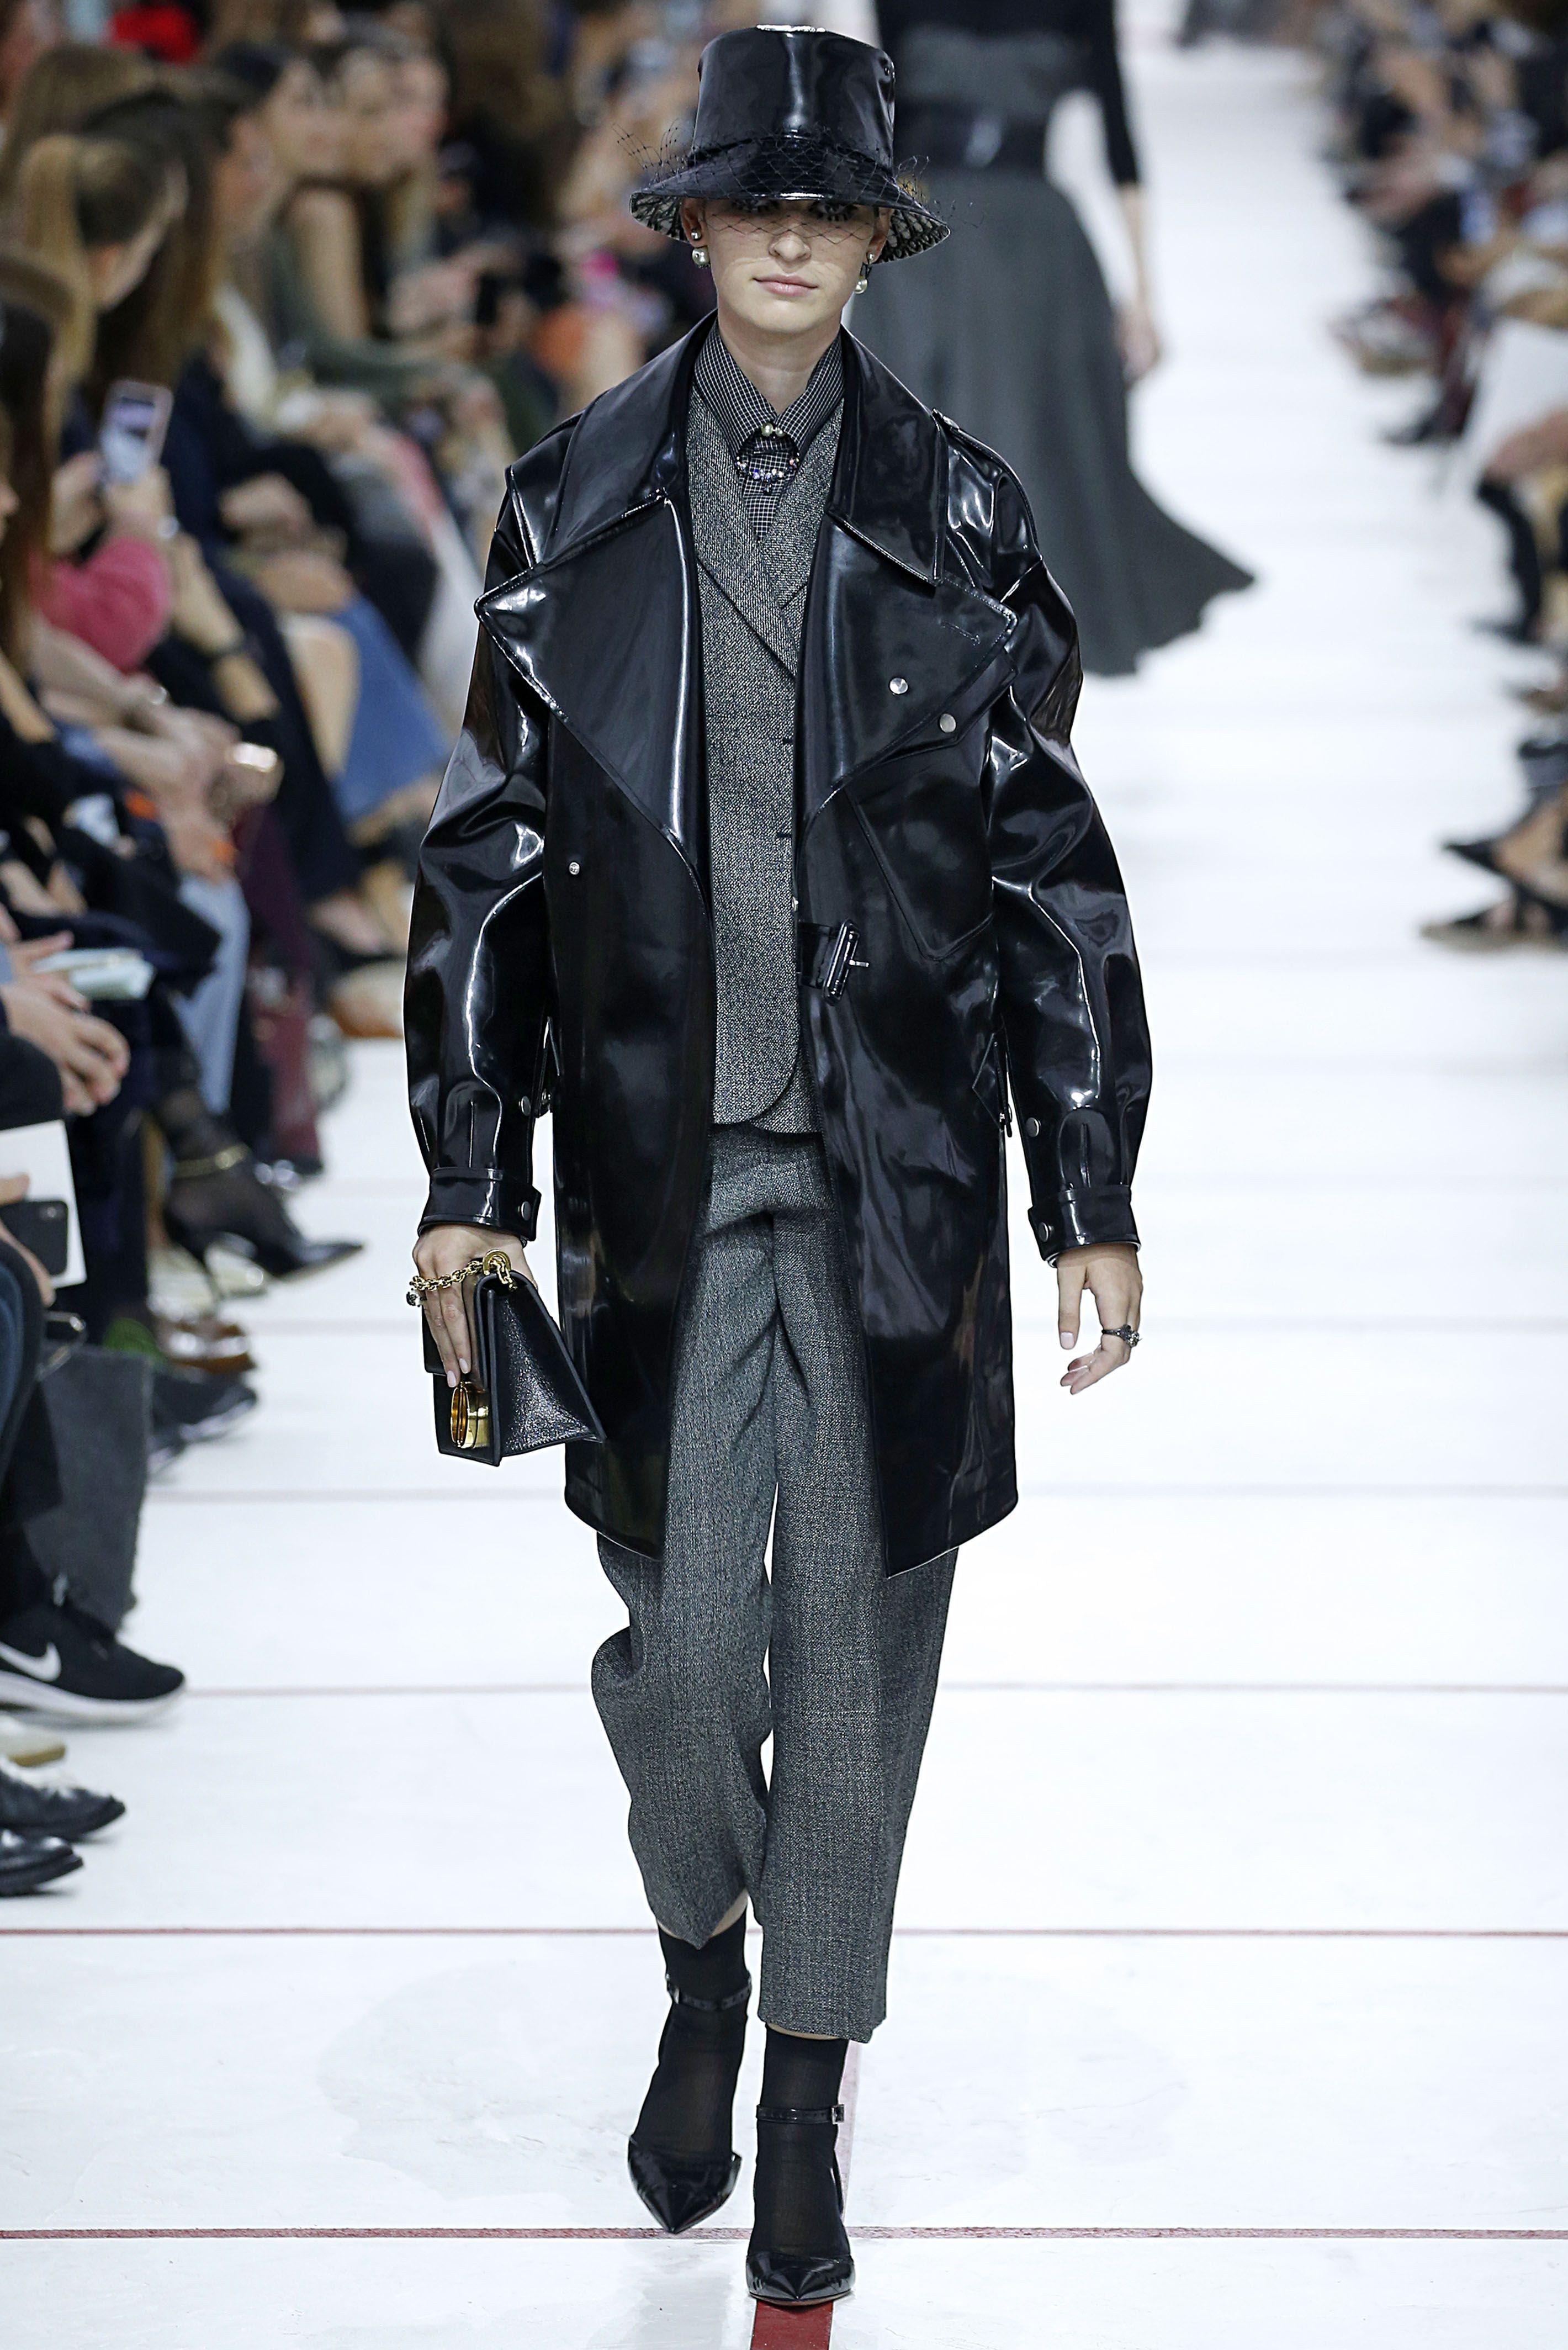 Christian Dior Fall Winter 2019